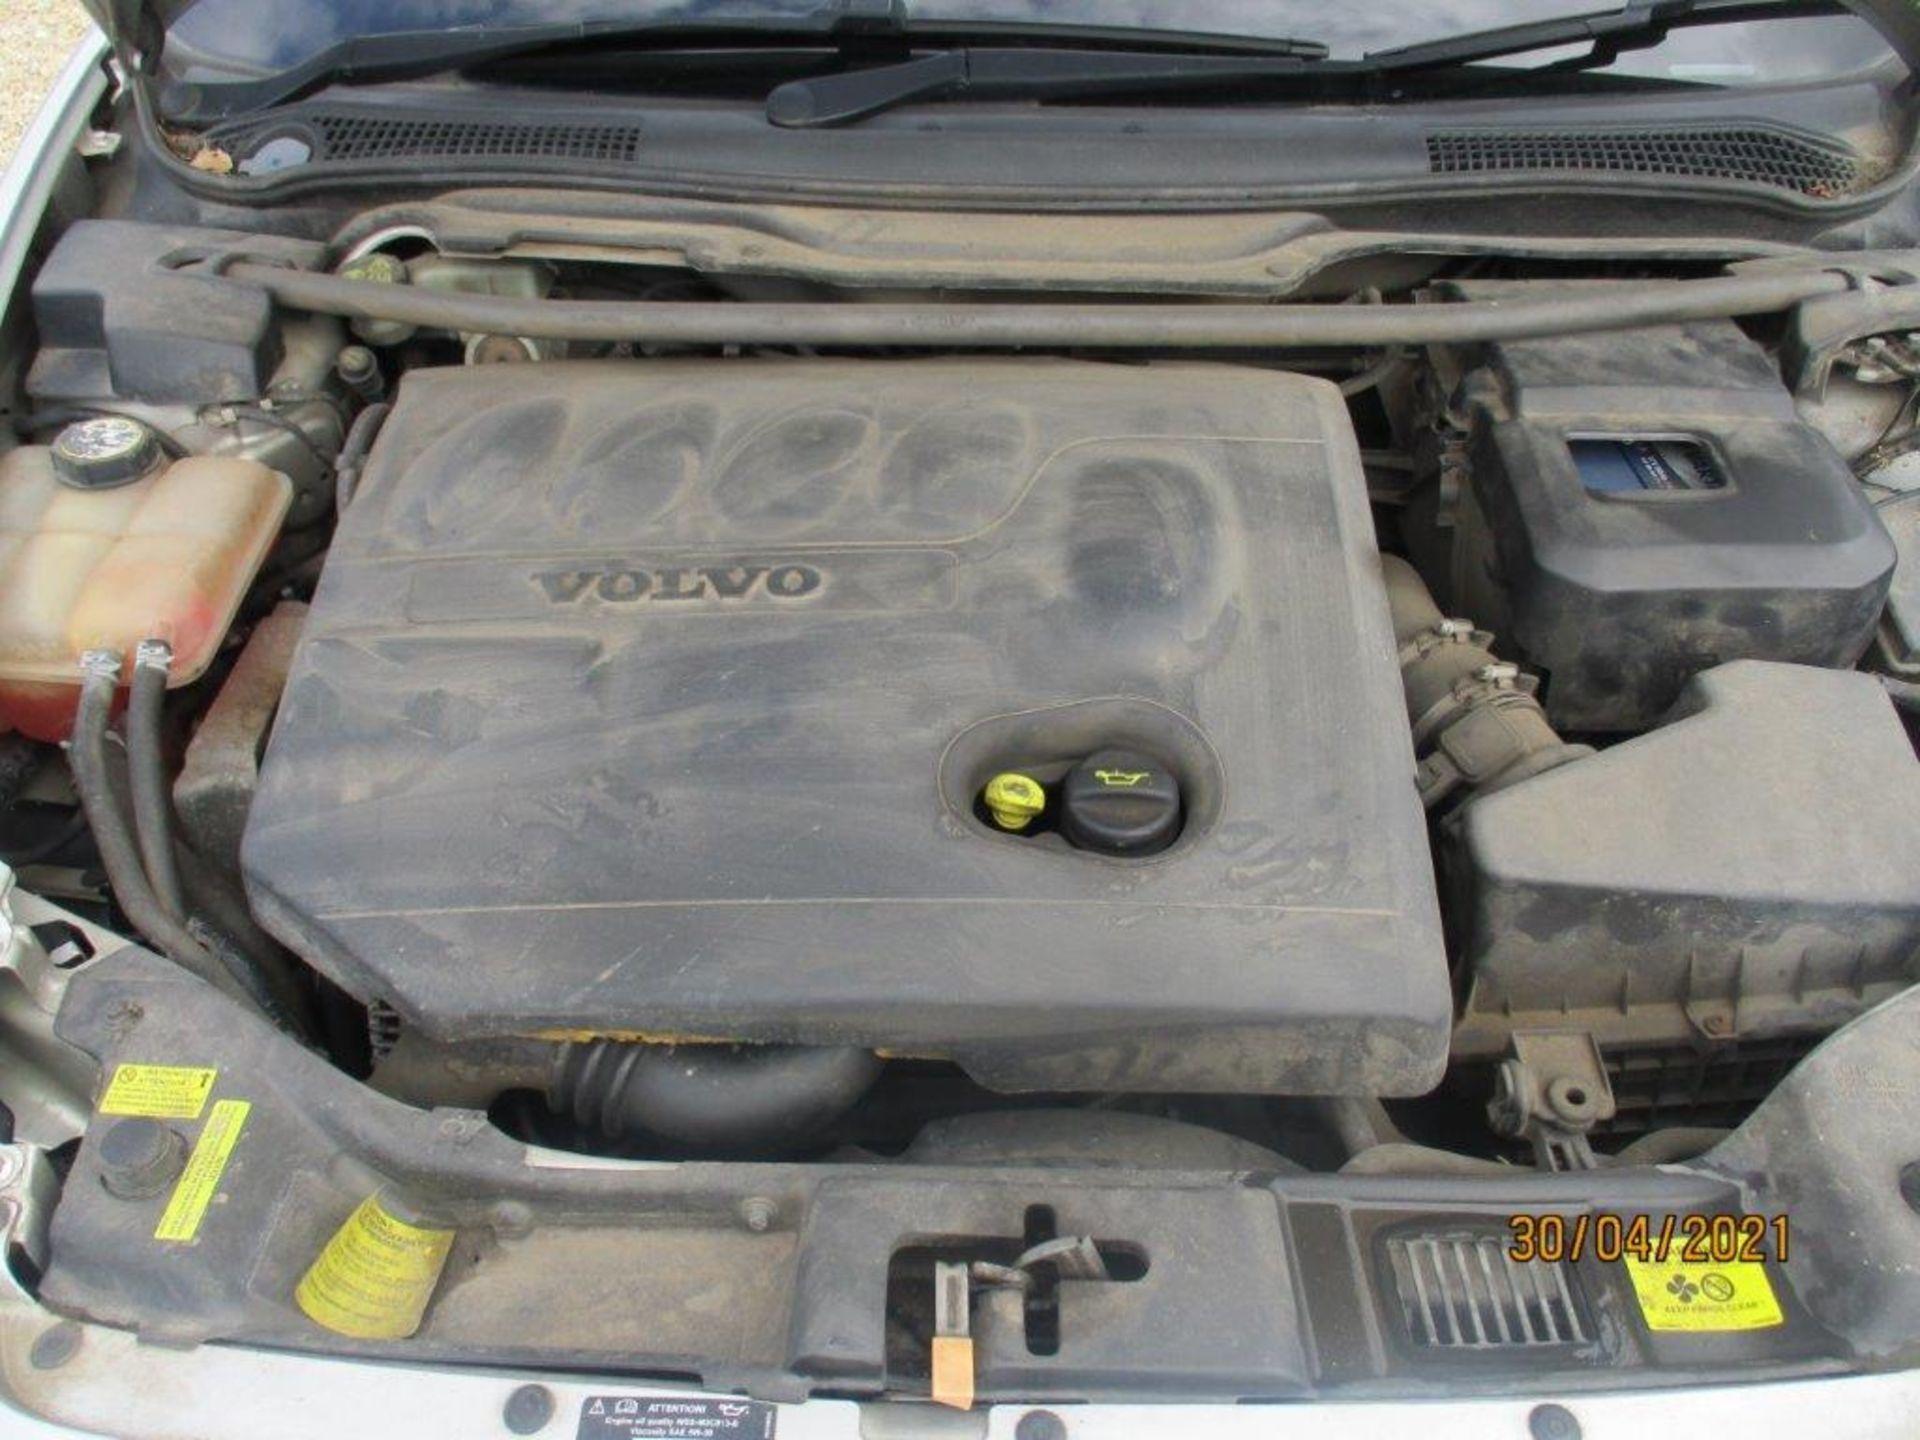 06 06 Volvo V50 SE D (E4) Est - Image 26 of 26